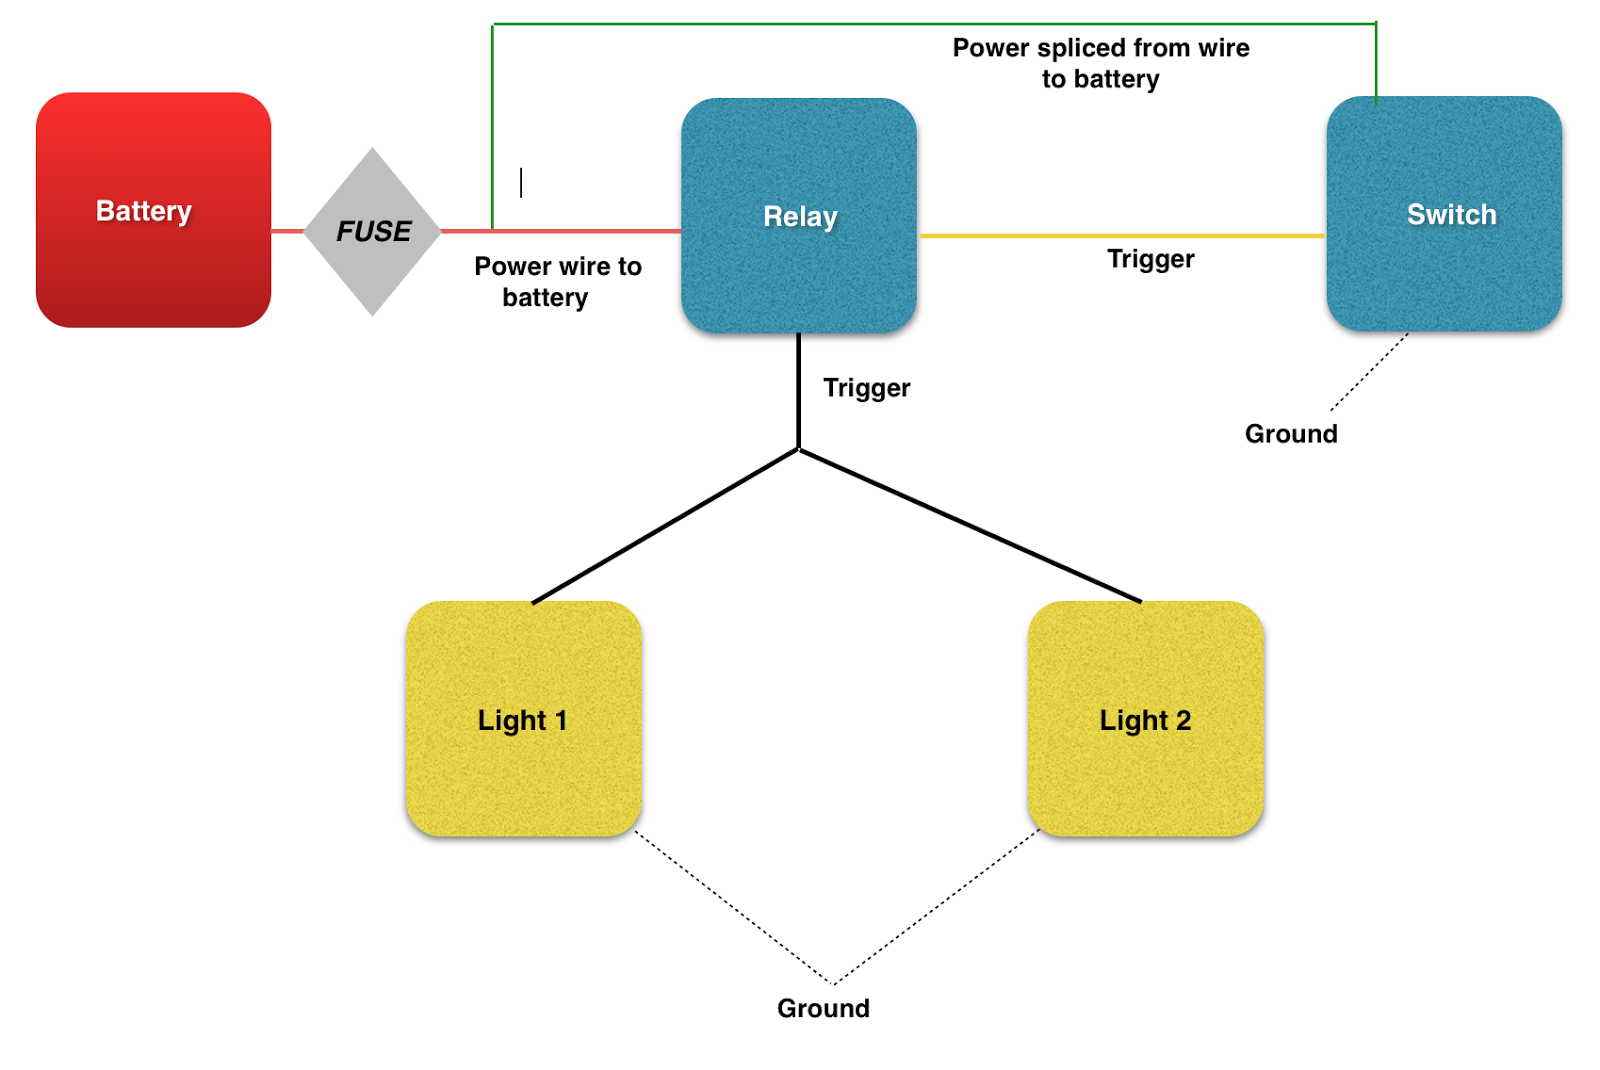 hight resolution of hazard flasher diagrams u hella picturesque png 1600x1070 hazard flasher diagrams u2022 hella picturesque